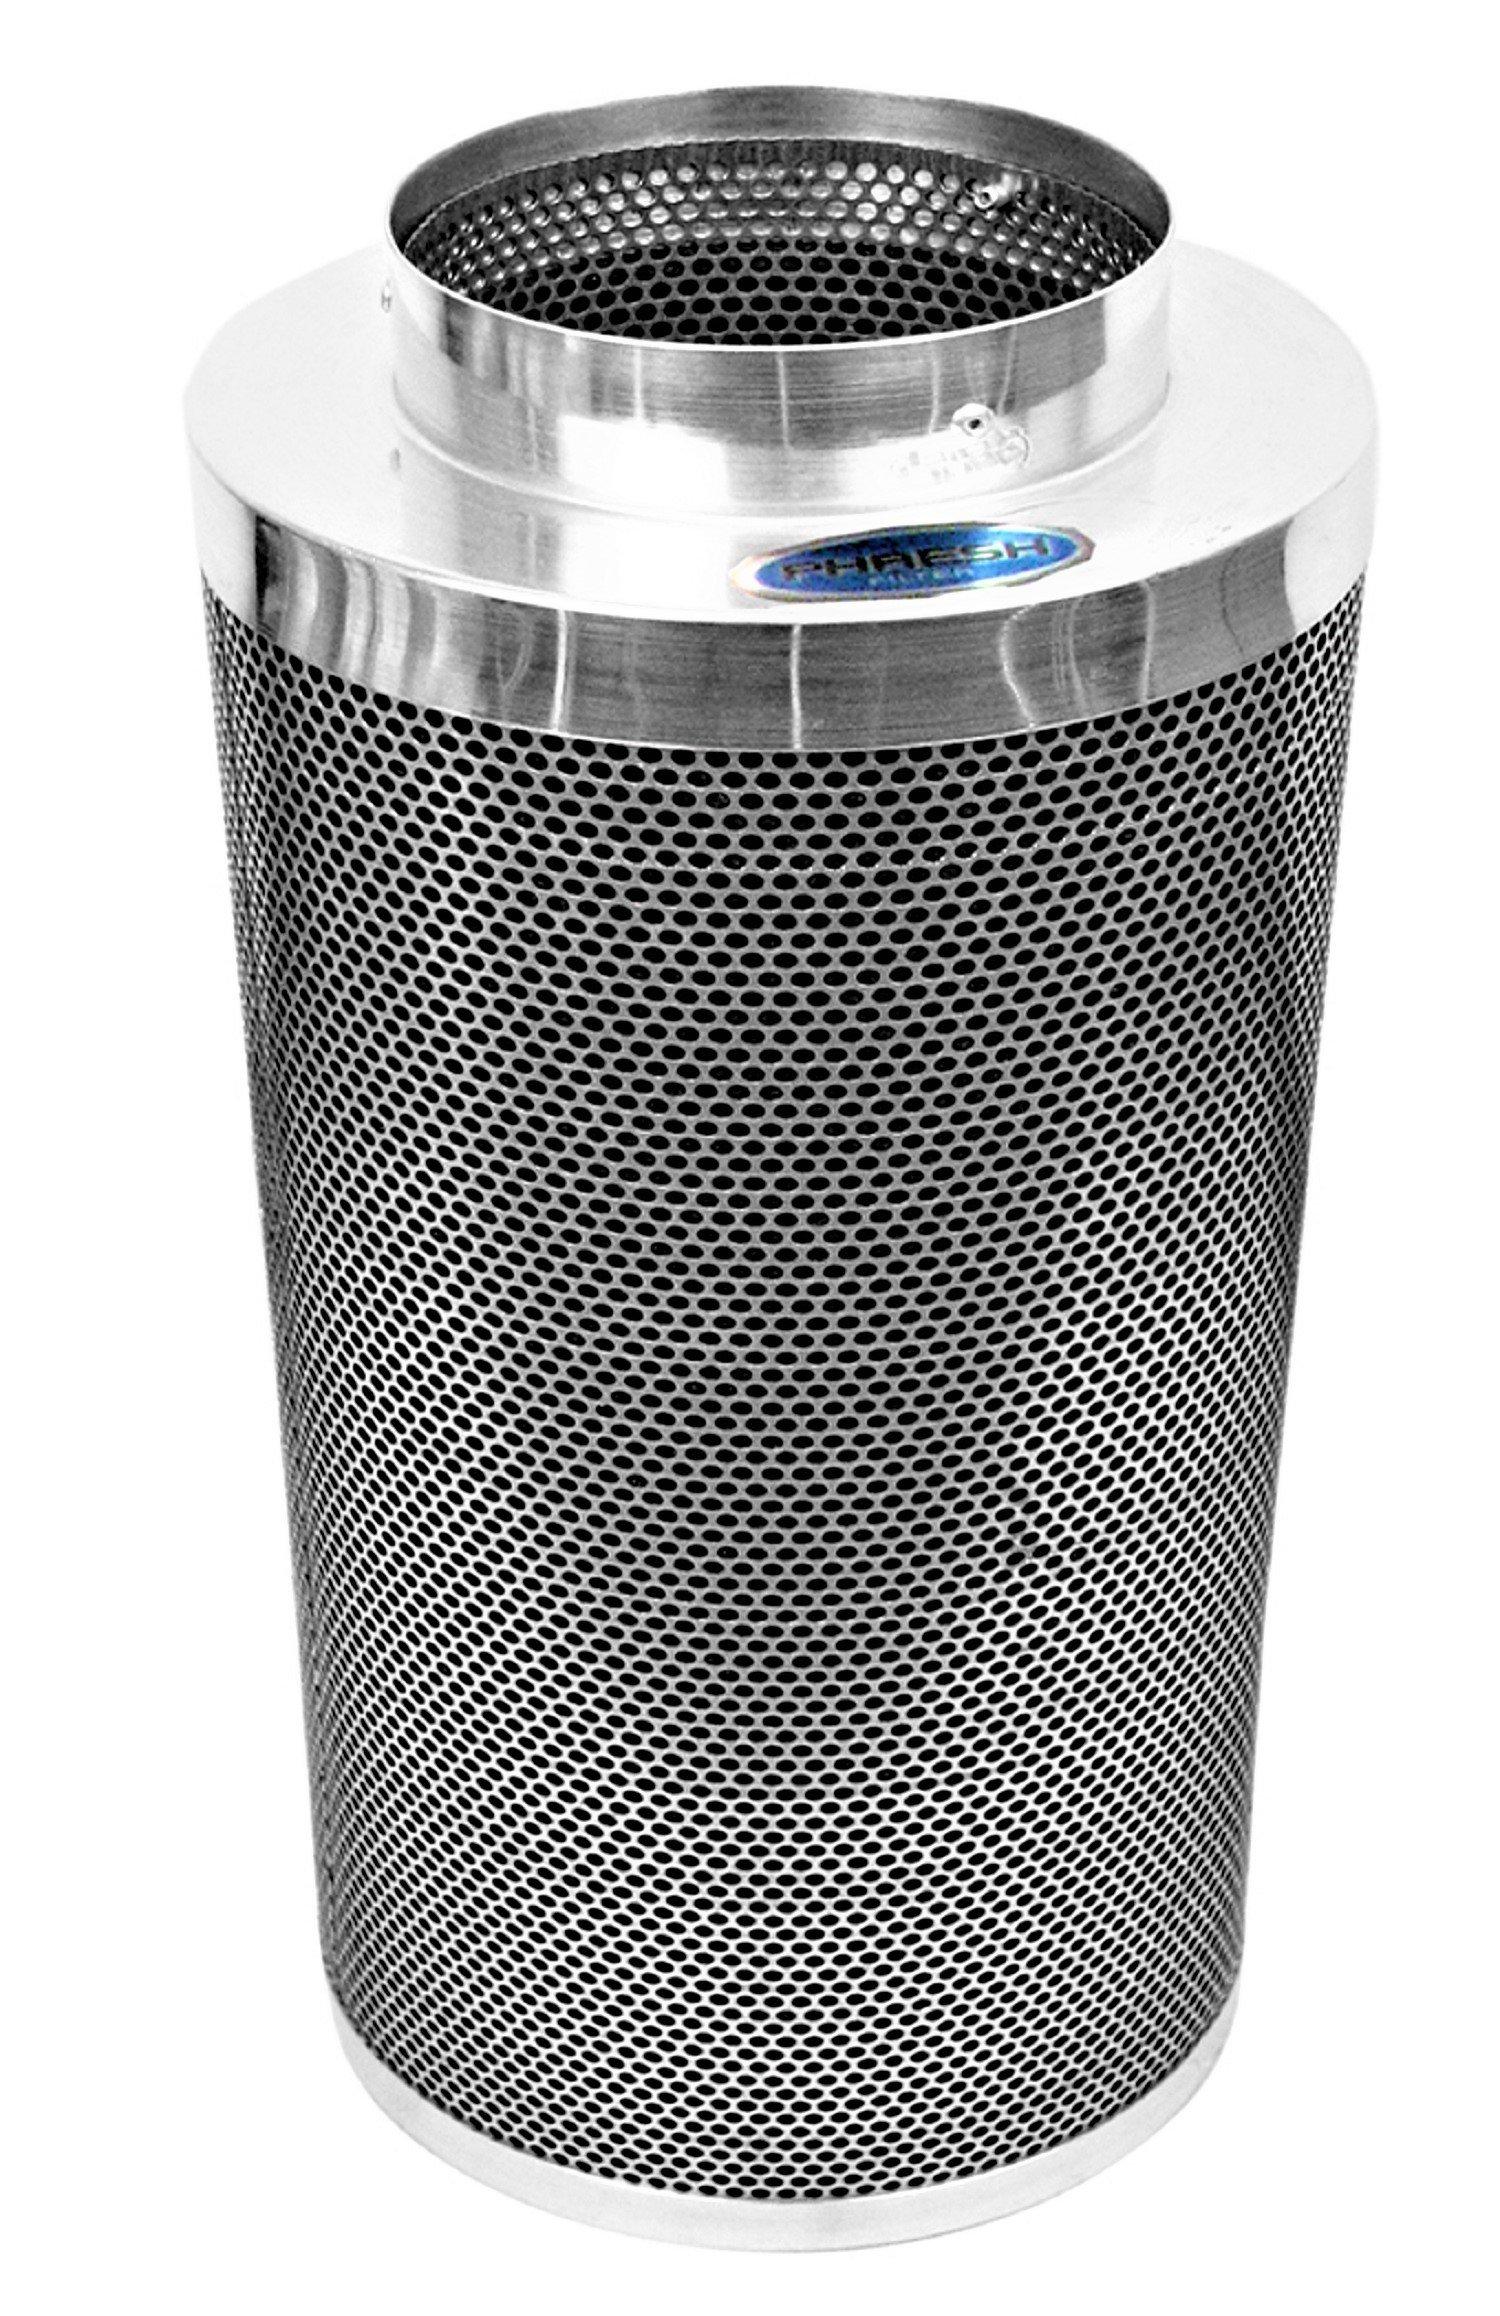 Phresh Filter 8 in x 24 in 750 CFM by Phresh (Image #1)